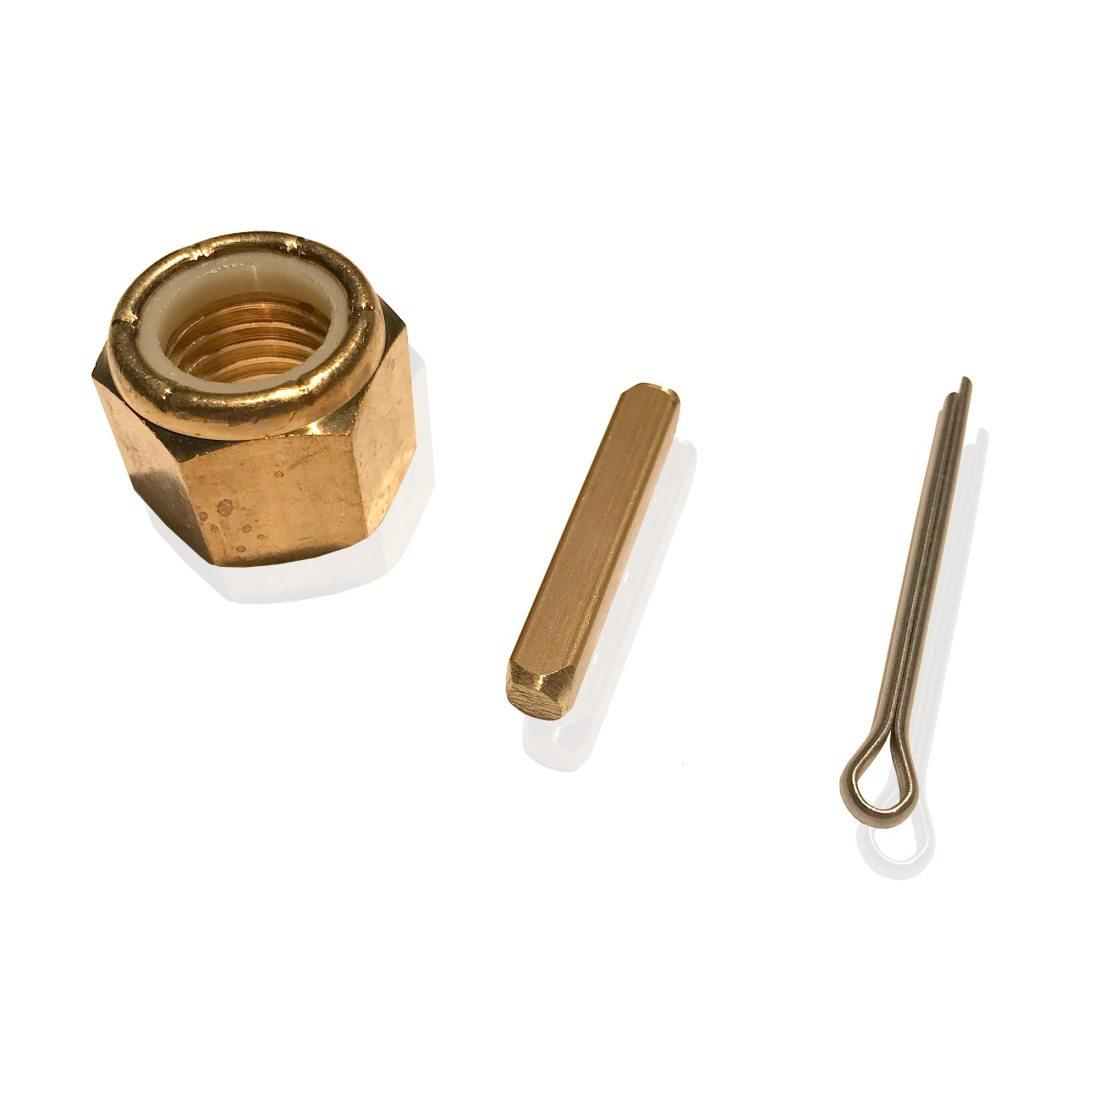 Prop Nut Kit